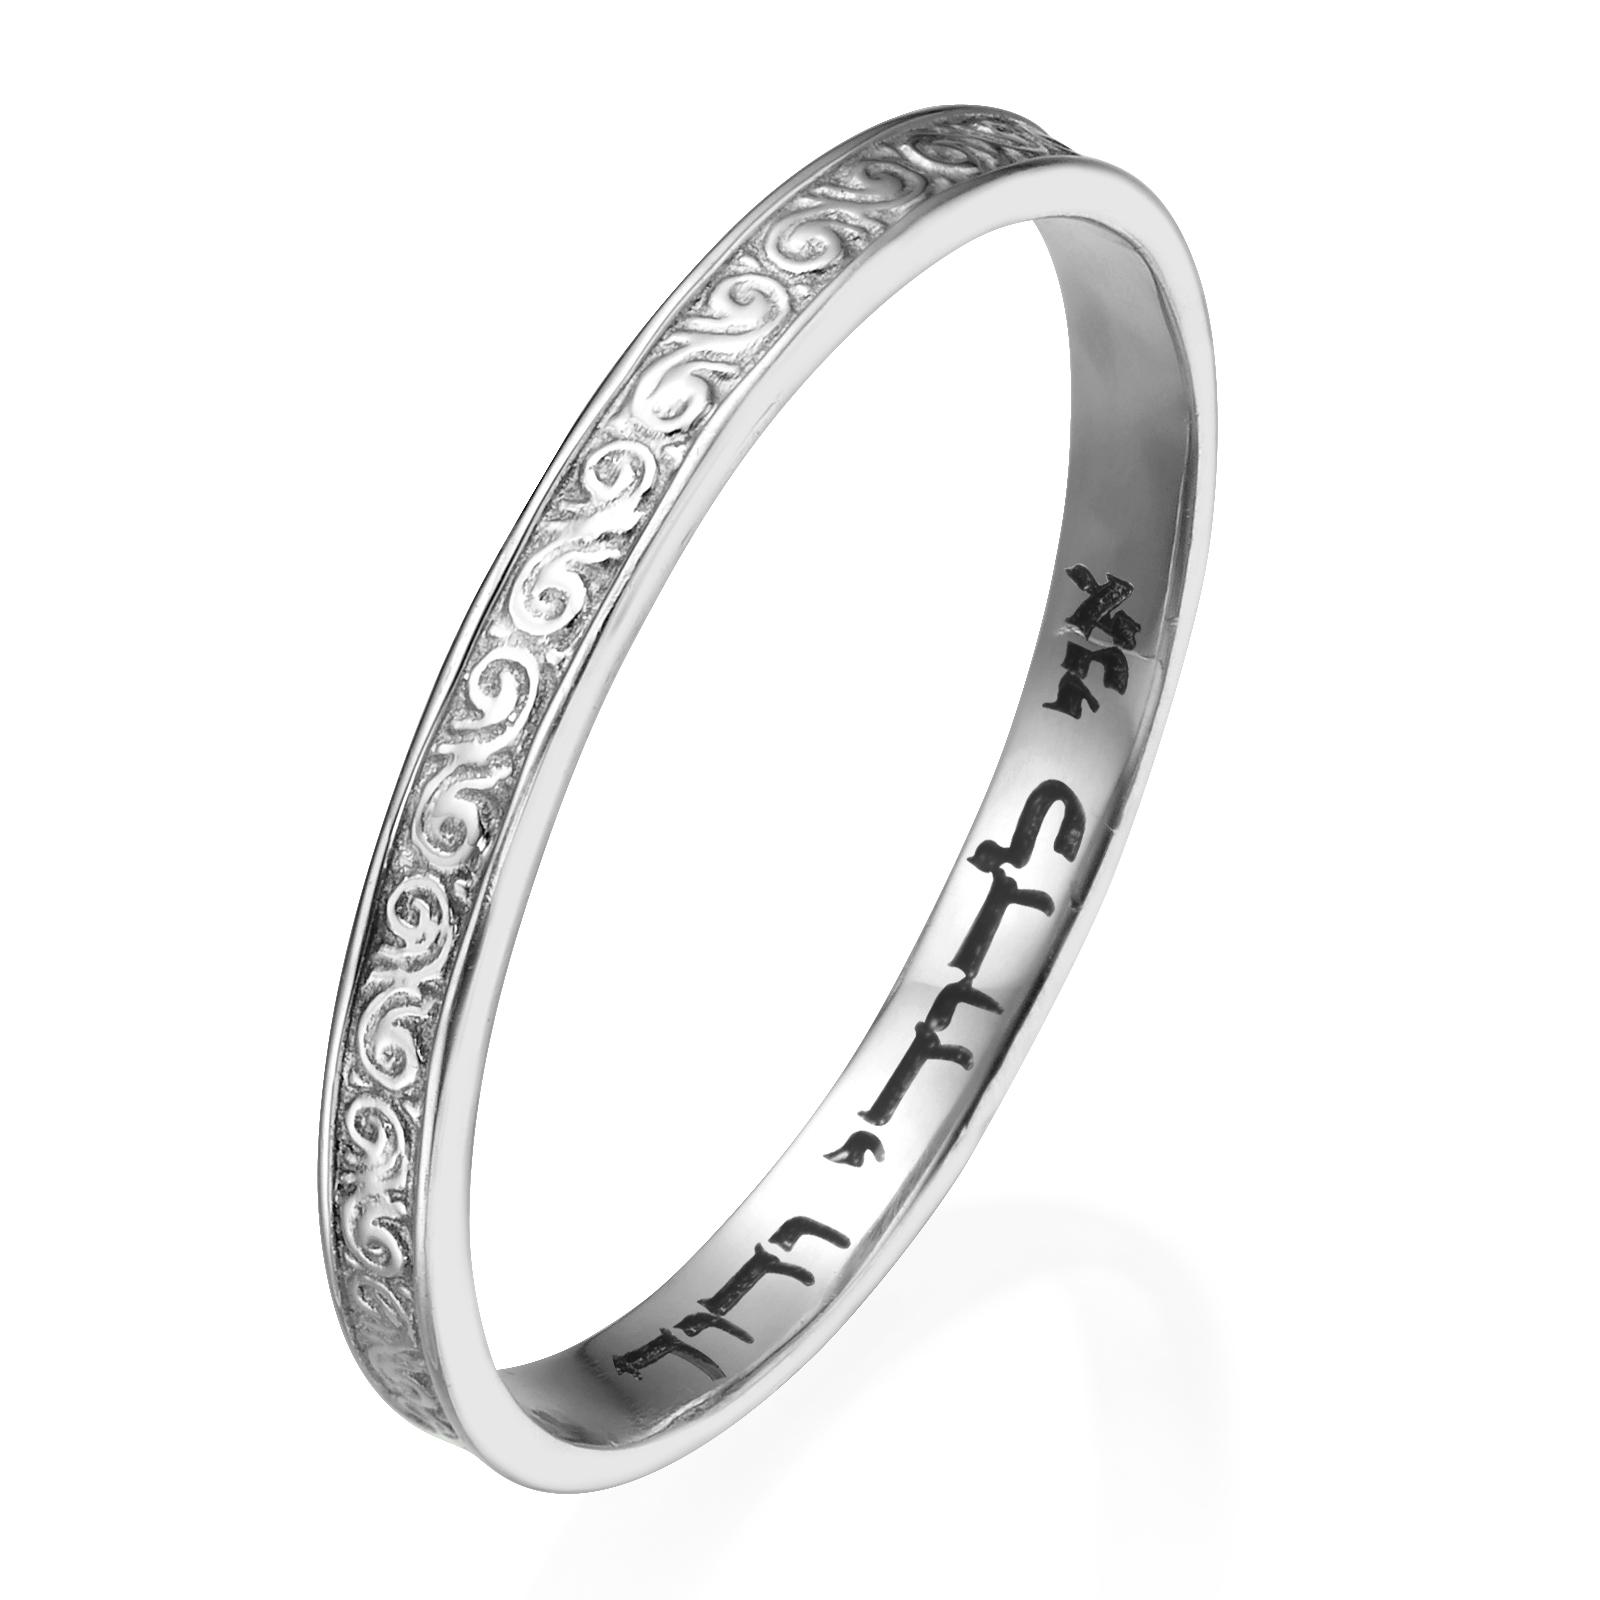 Hammered Rose Gold Wedding Band Laser Engraved 3 - Baltinester Jewelry